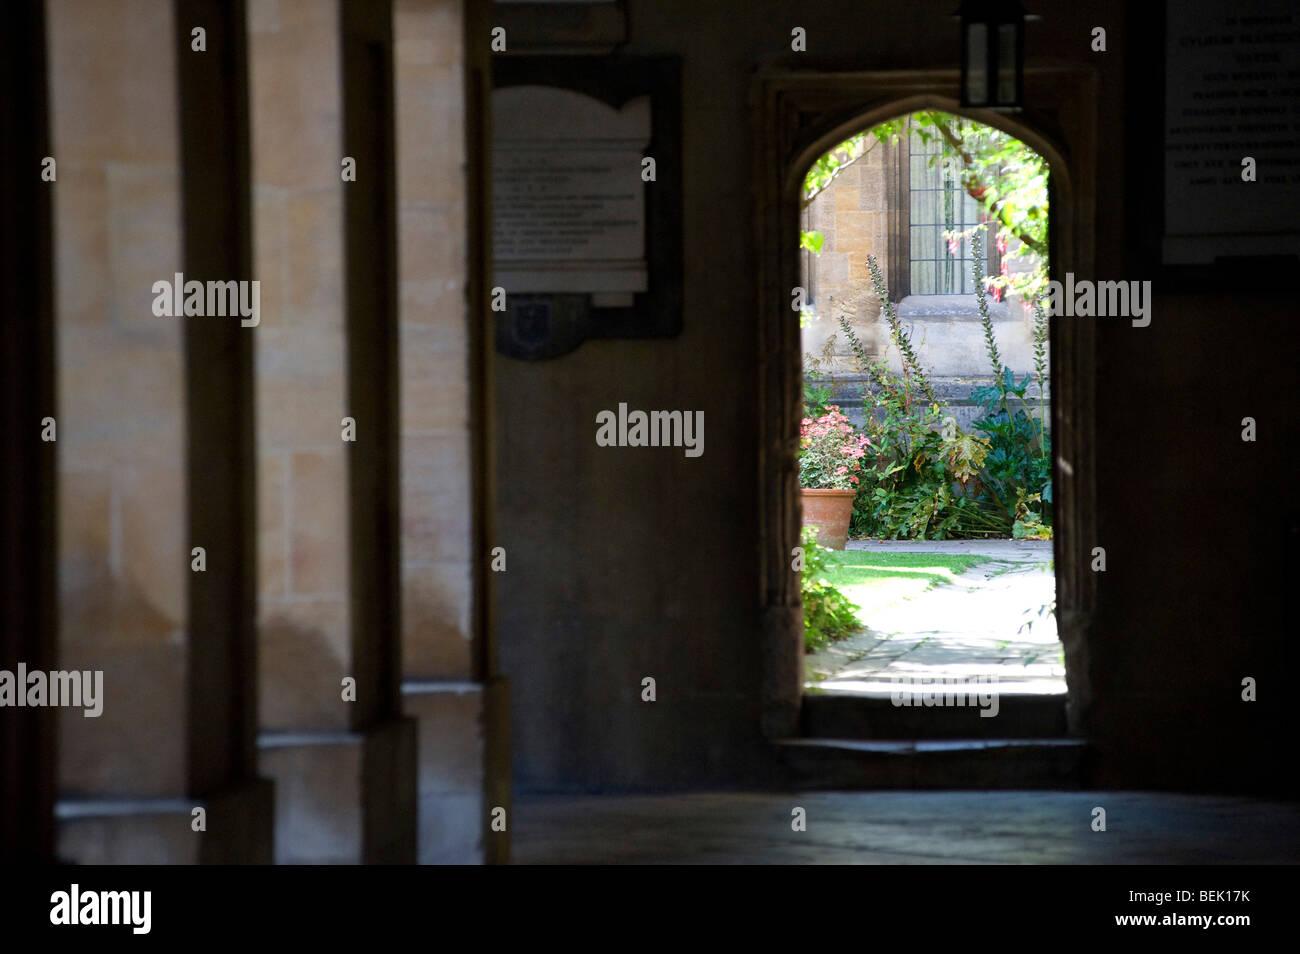 Corpus Christi College Oxford University, through cloisters to the gardern - Stock Image